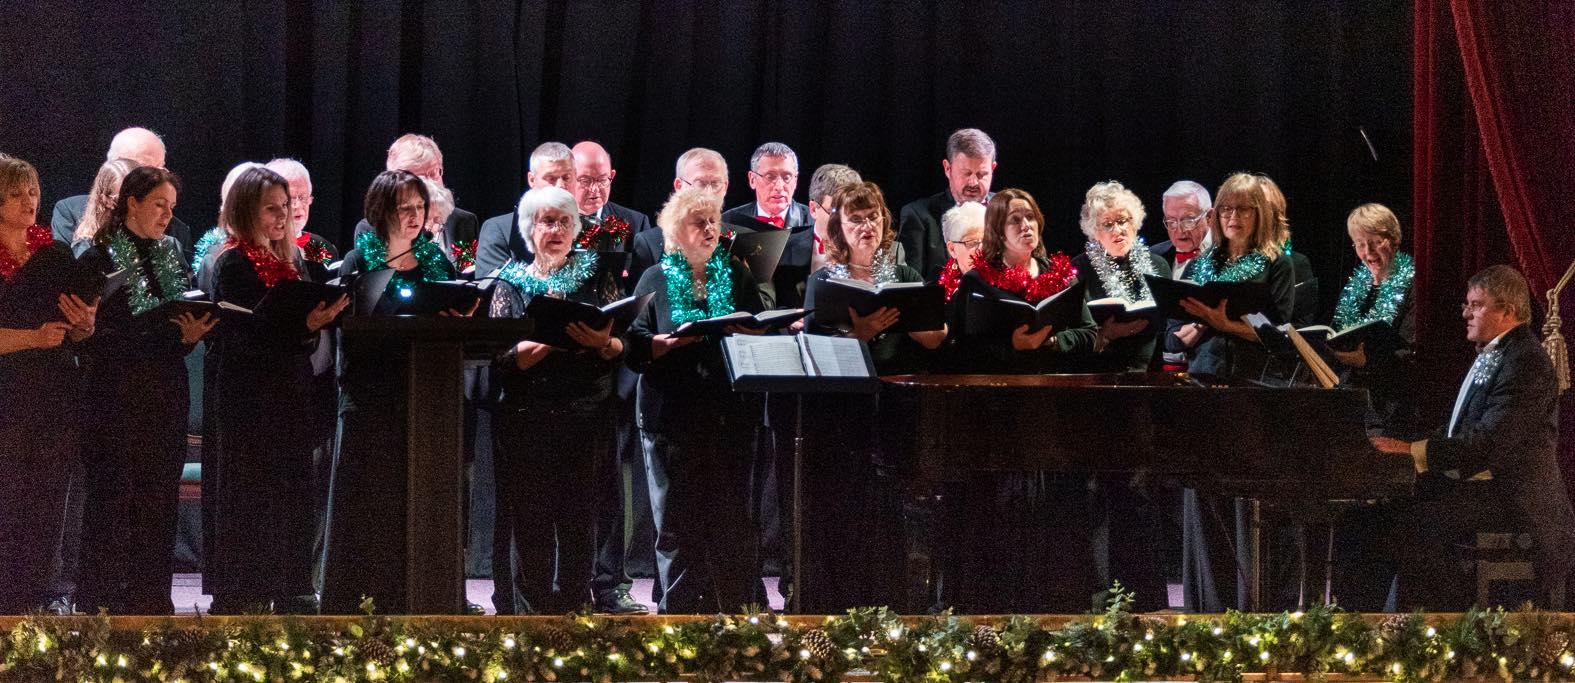 Rosenethe Singers Dec 2019a